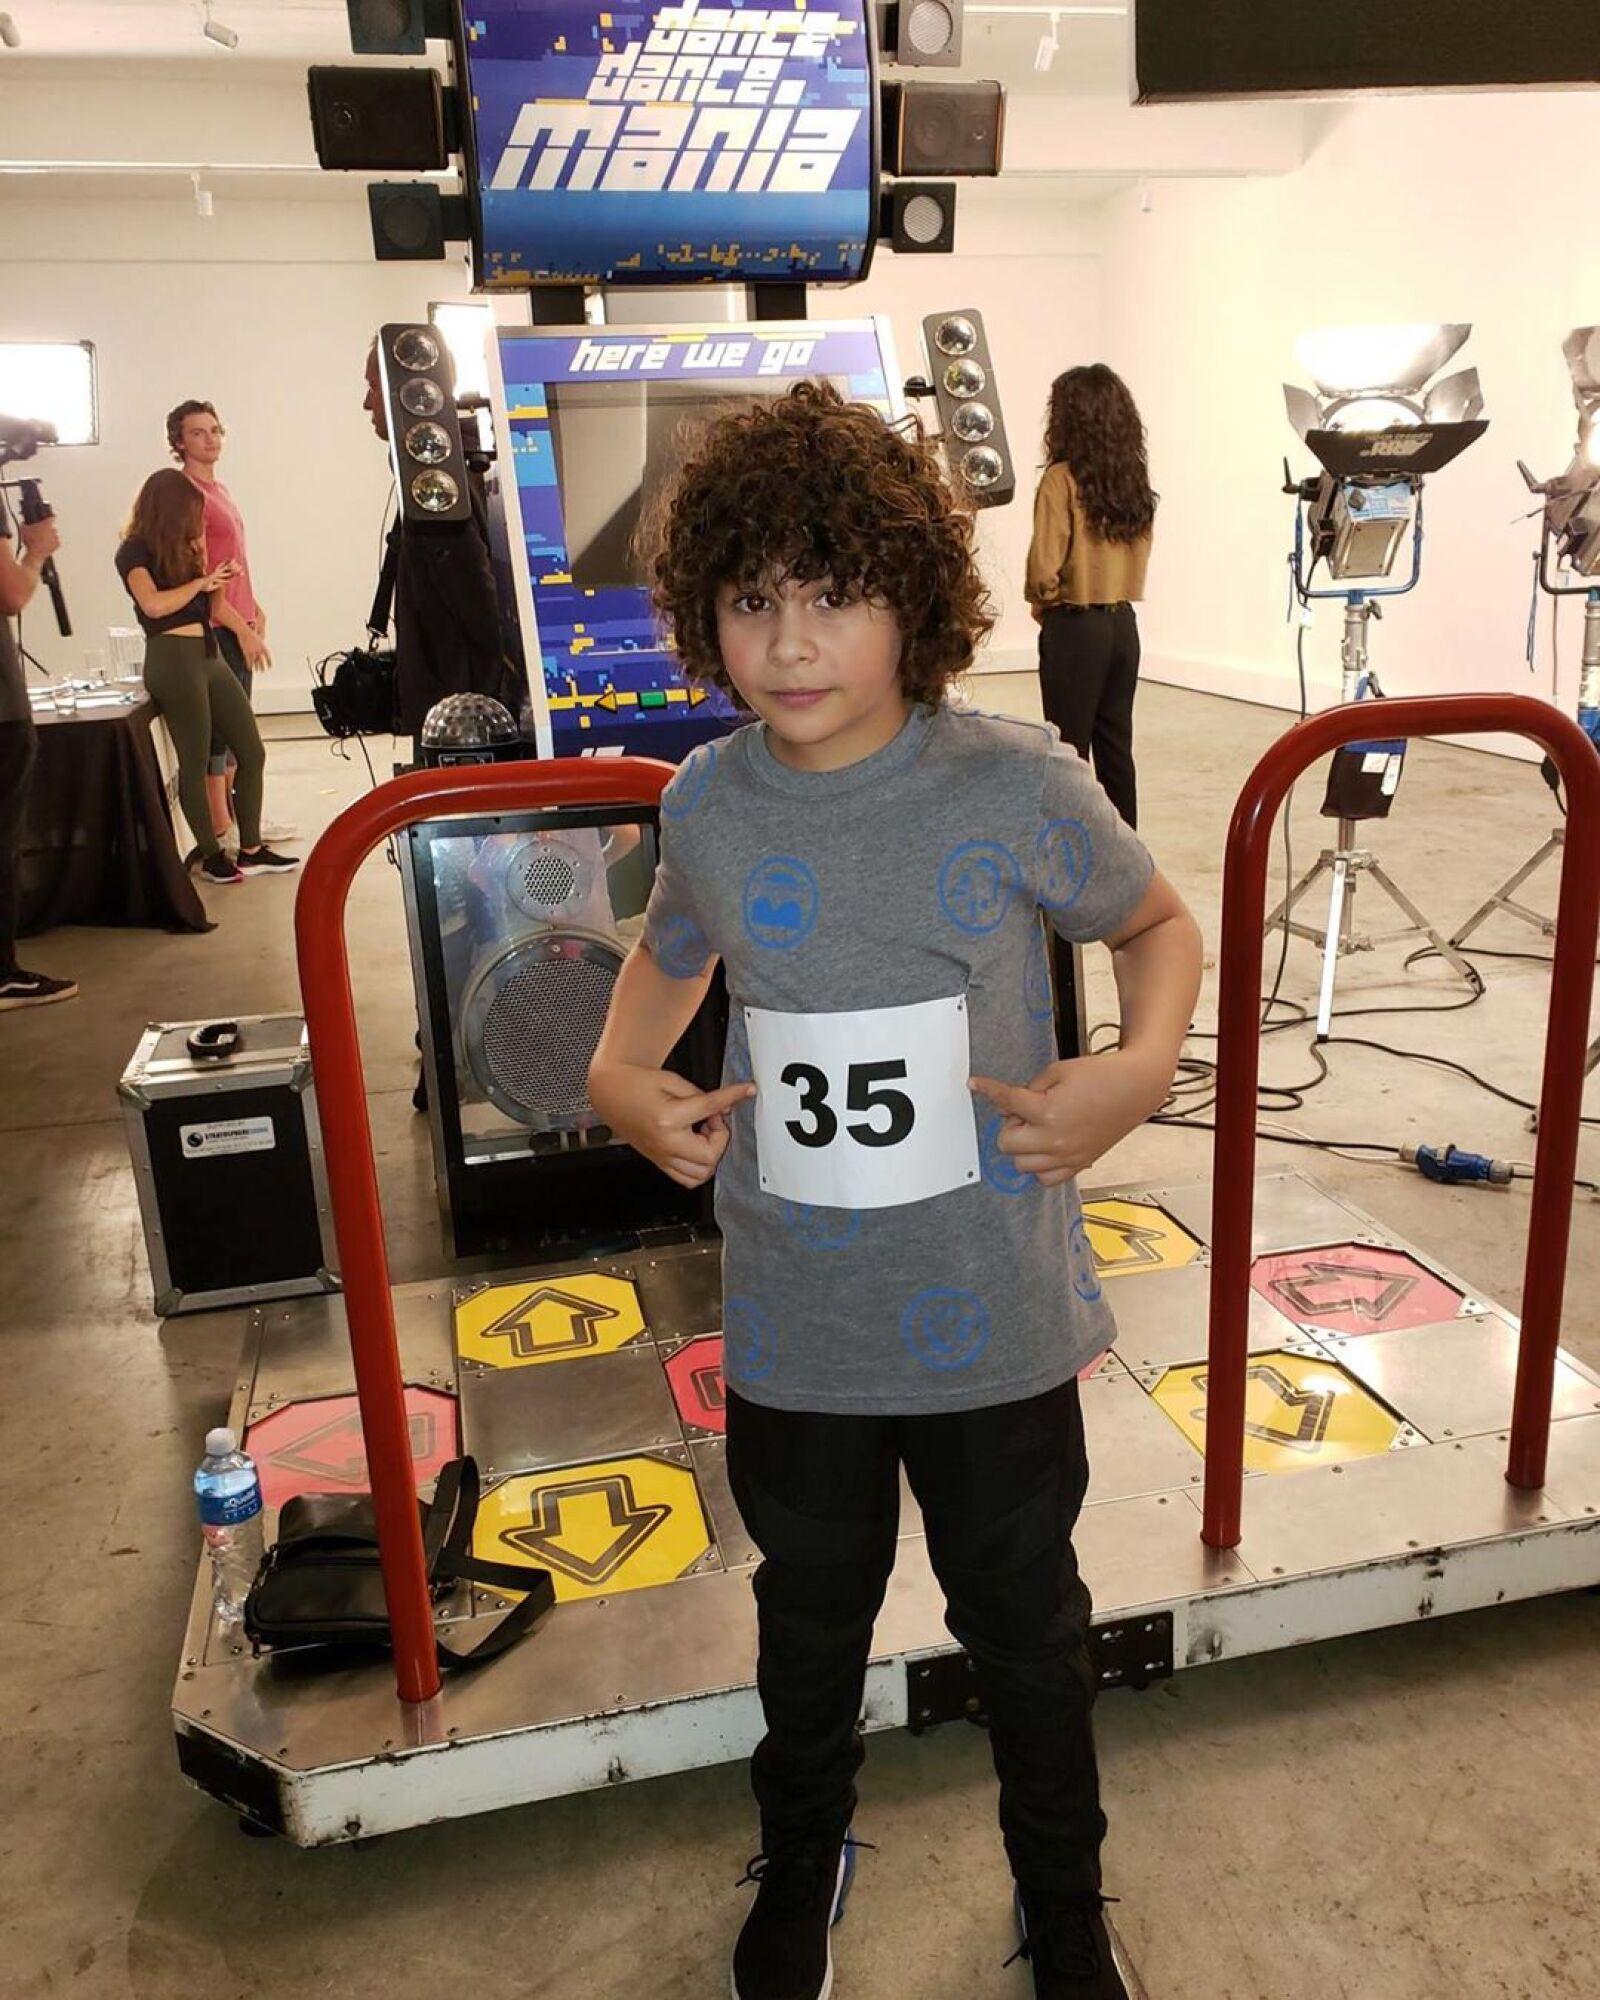 Carson White de 11 años interpreta a Brad Evans en The Kissing Booth